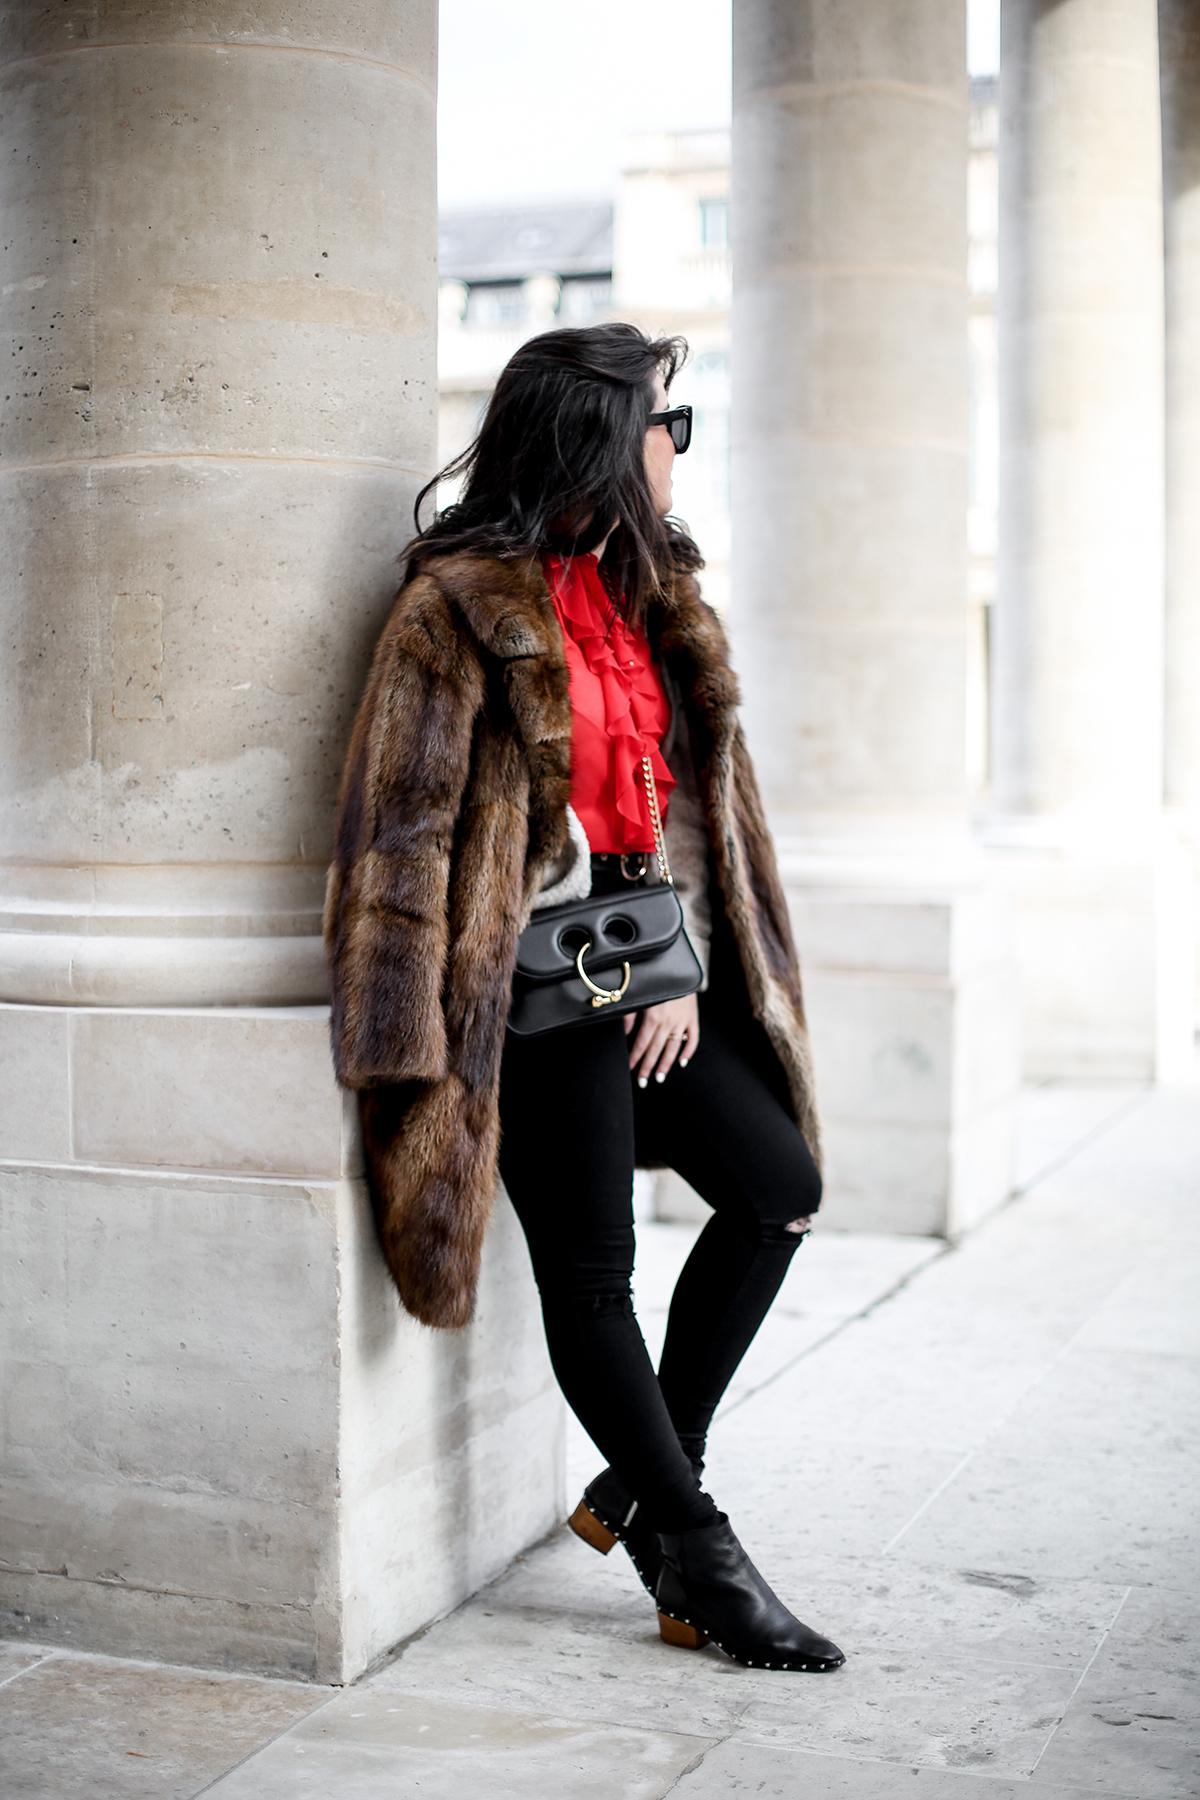 camisa-roja-volantes-pipa-de-la-paz-abrigo-pelo-vintage-look-studded-boots-myblueberrynightsblog